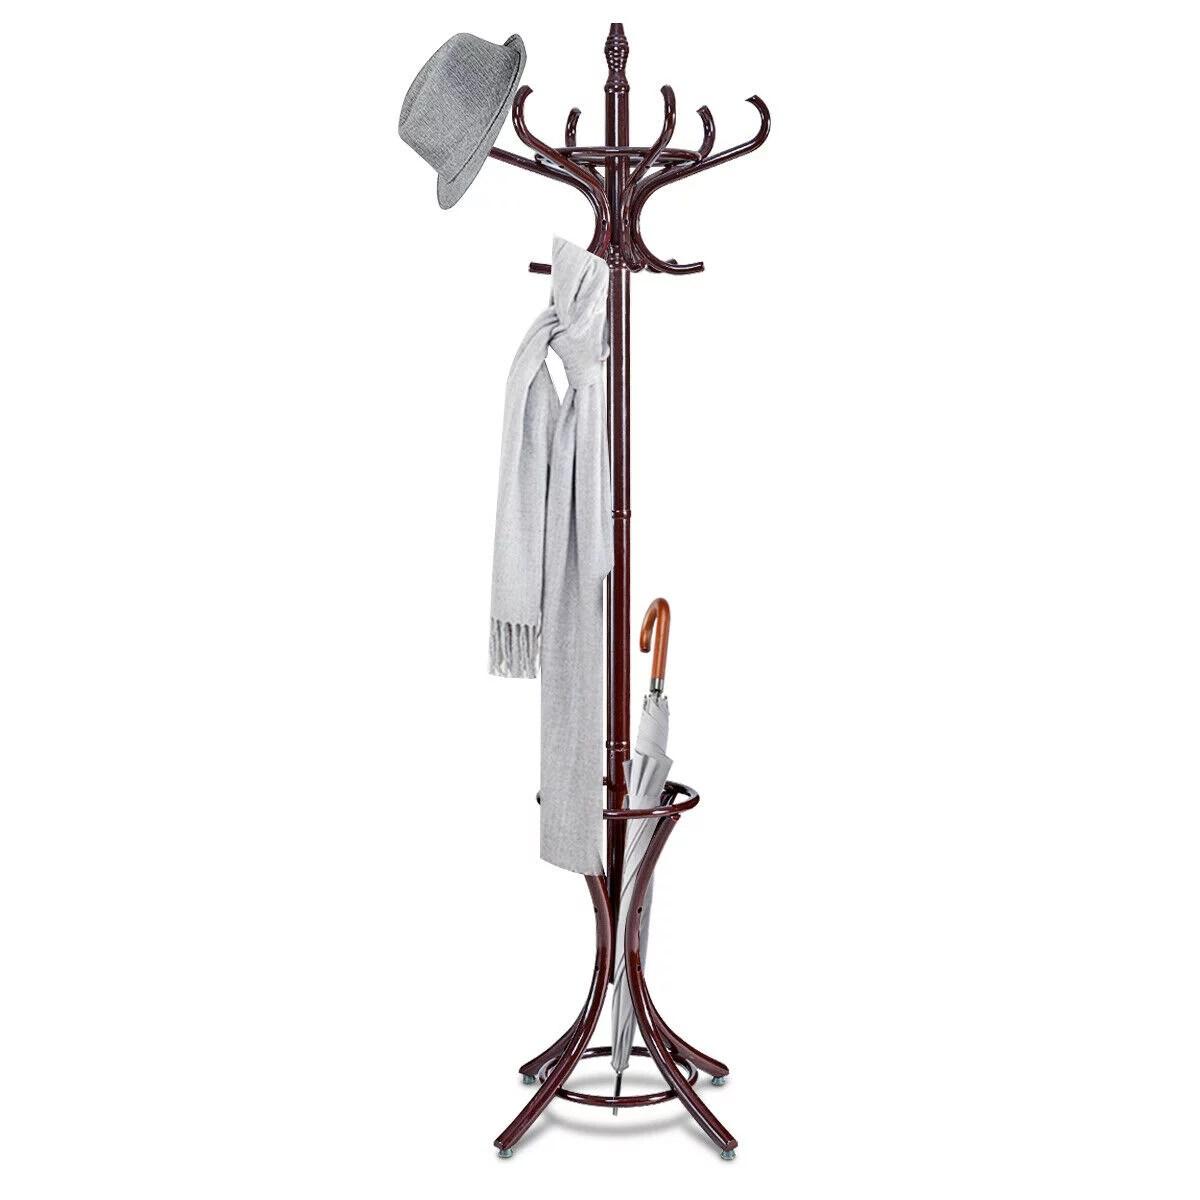 gymax wood standing hat coat rack jacket bag hanger tree 12 hooks w umbrella stand